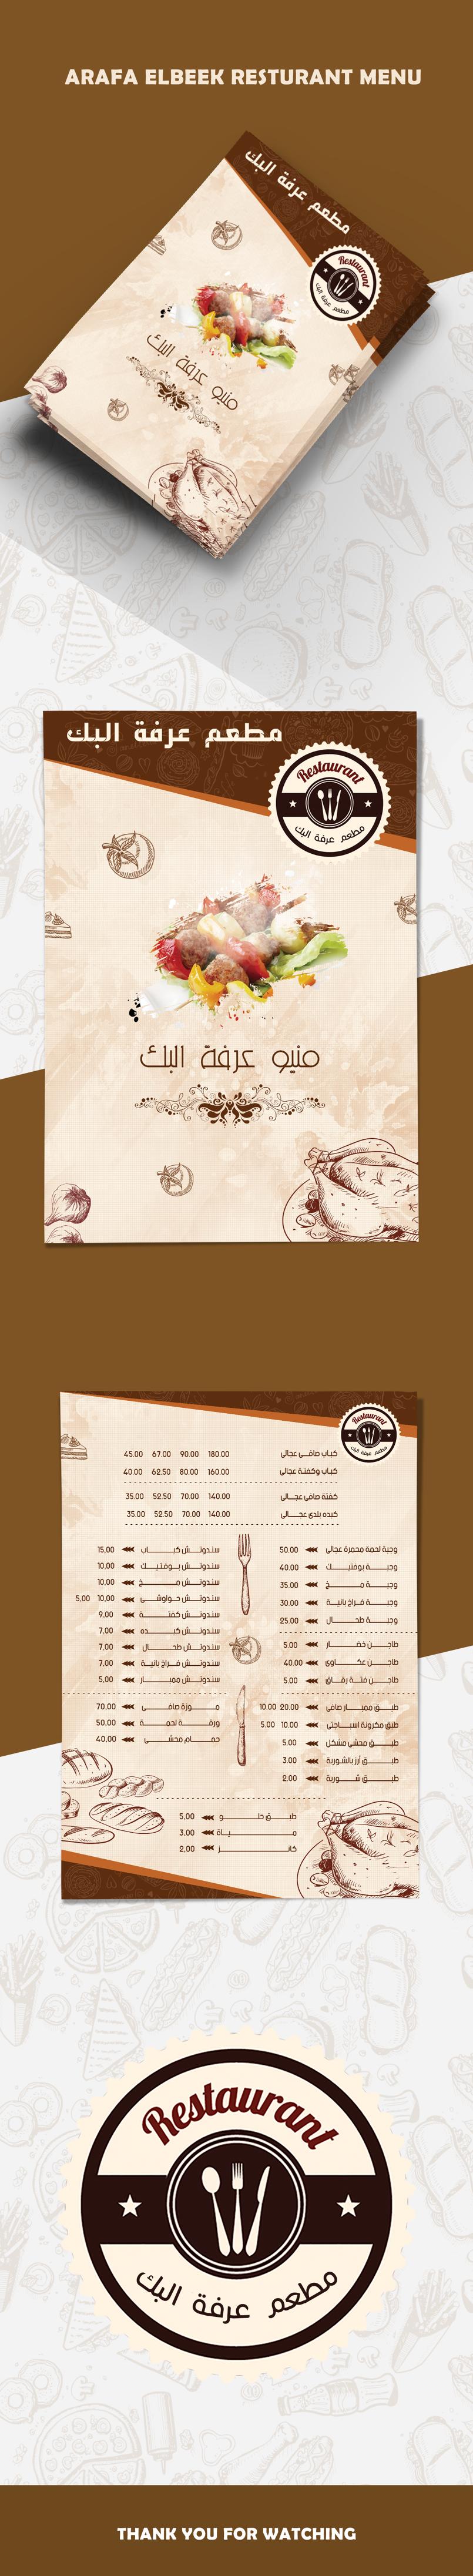 Menu - Arafa Elbeek Restaurant